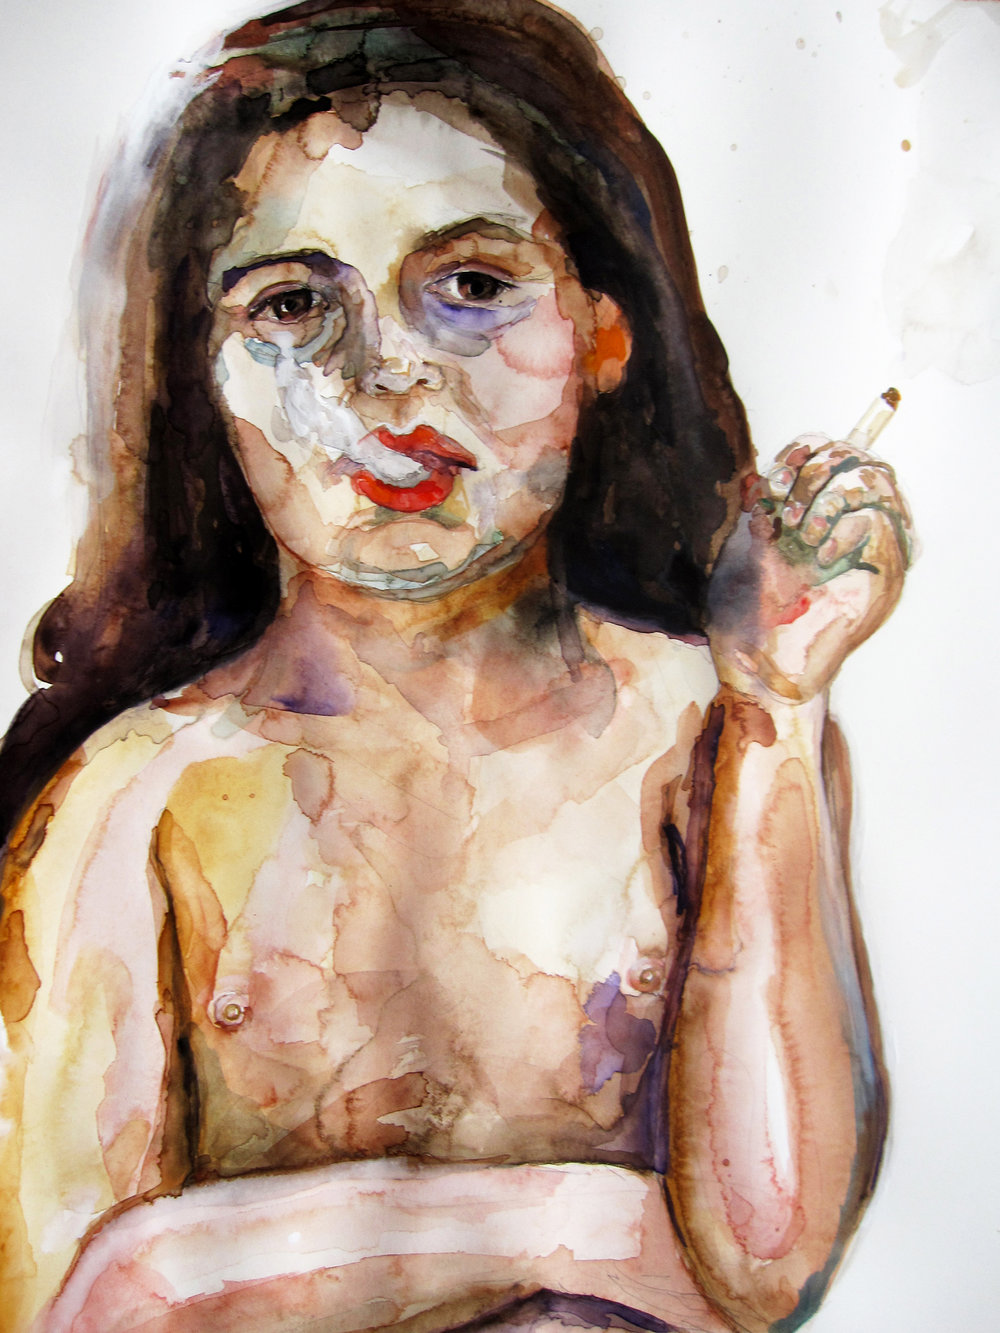 Fumando, 2010, Graphite and watercolor on paper, 30 x 22 in.